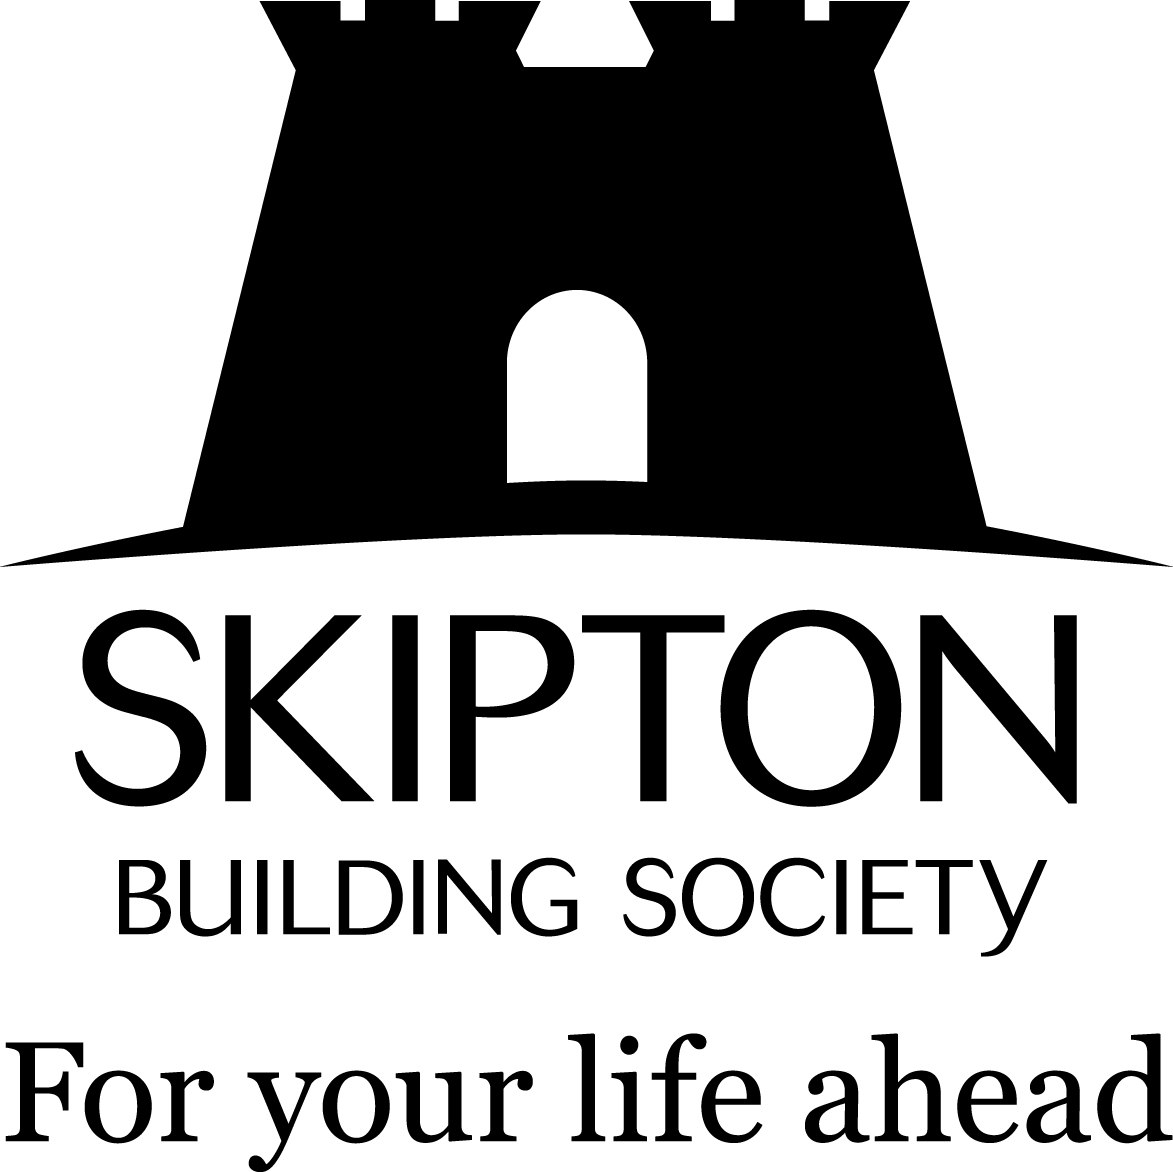 Image library - Skipton Building Society